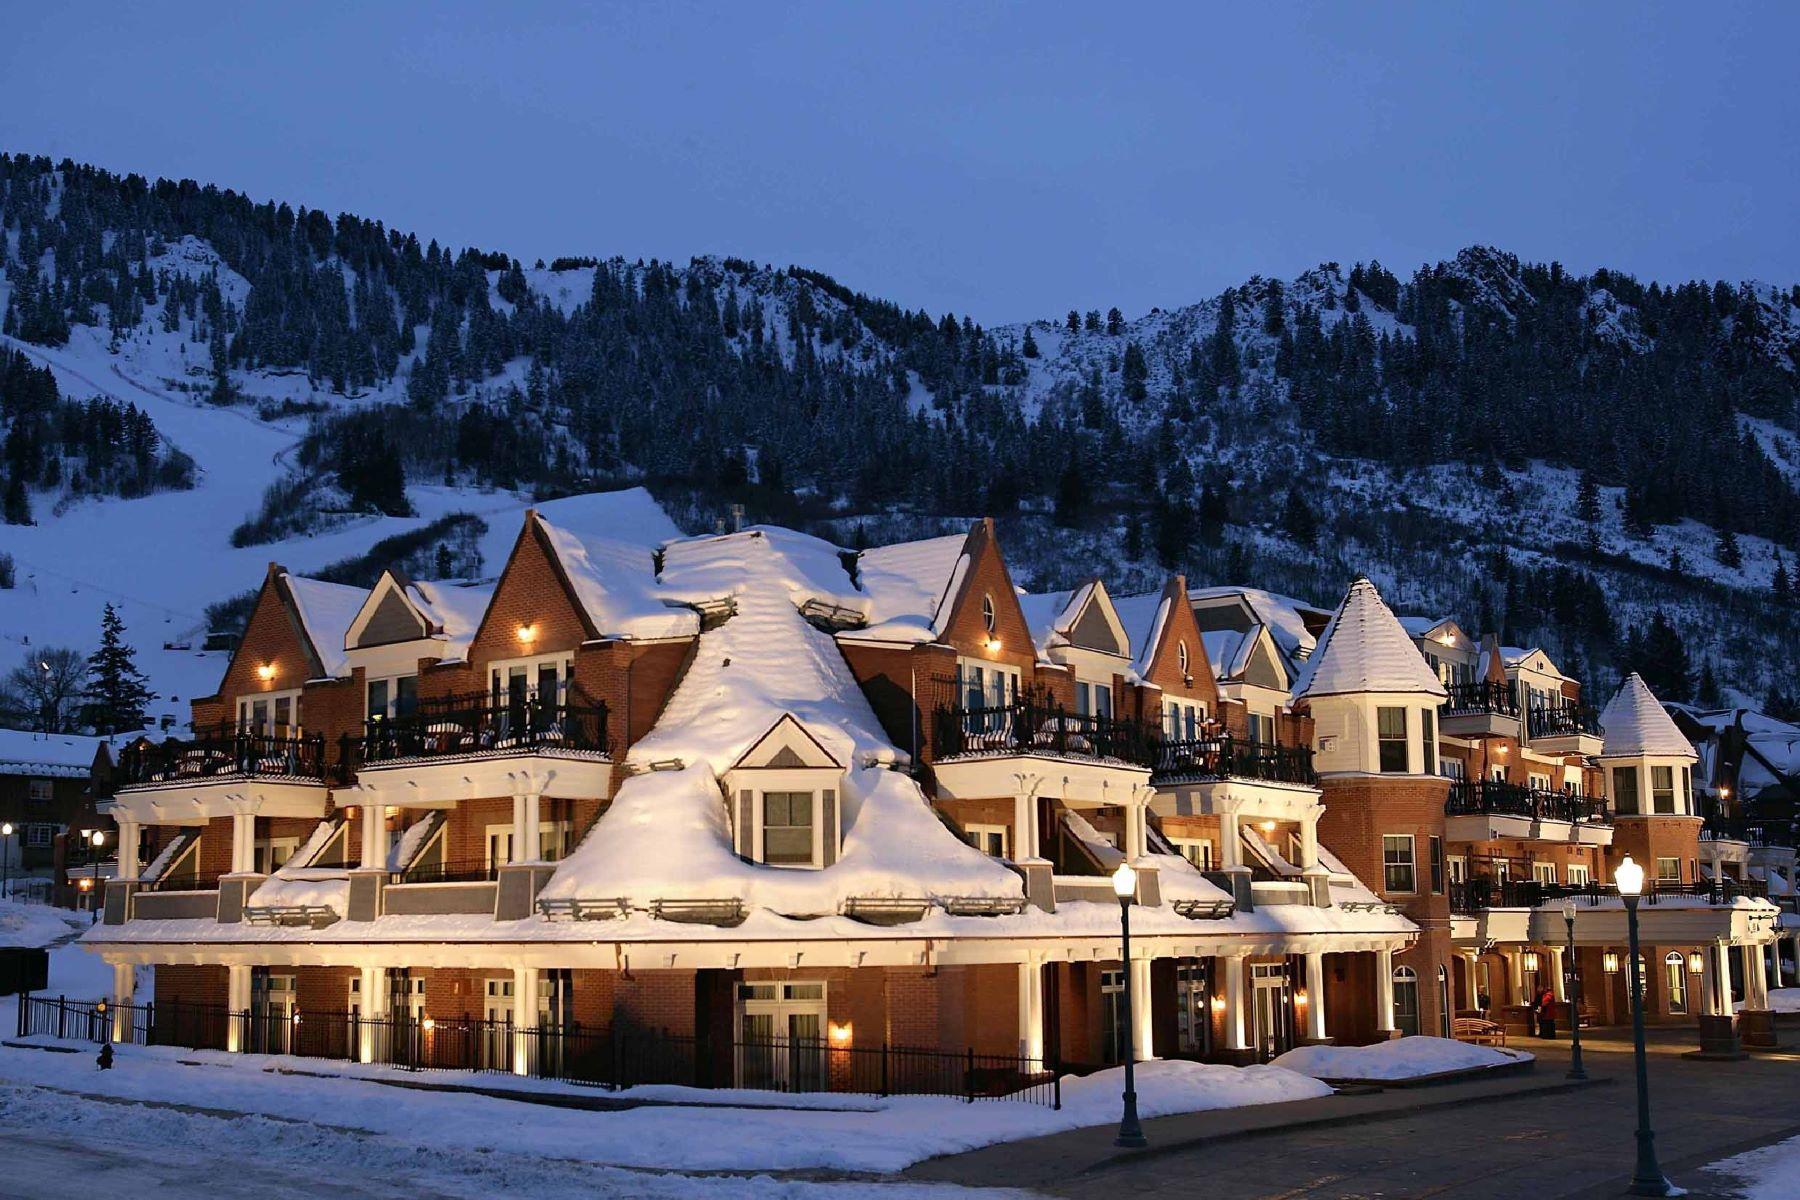 Fractional Ownership for Sale at The Hyatt Grand Aspen 415 East Dean Street Unit 5 Week 9 Aspen, Colorado 81611 United States